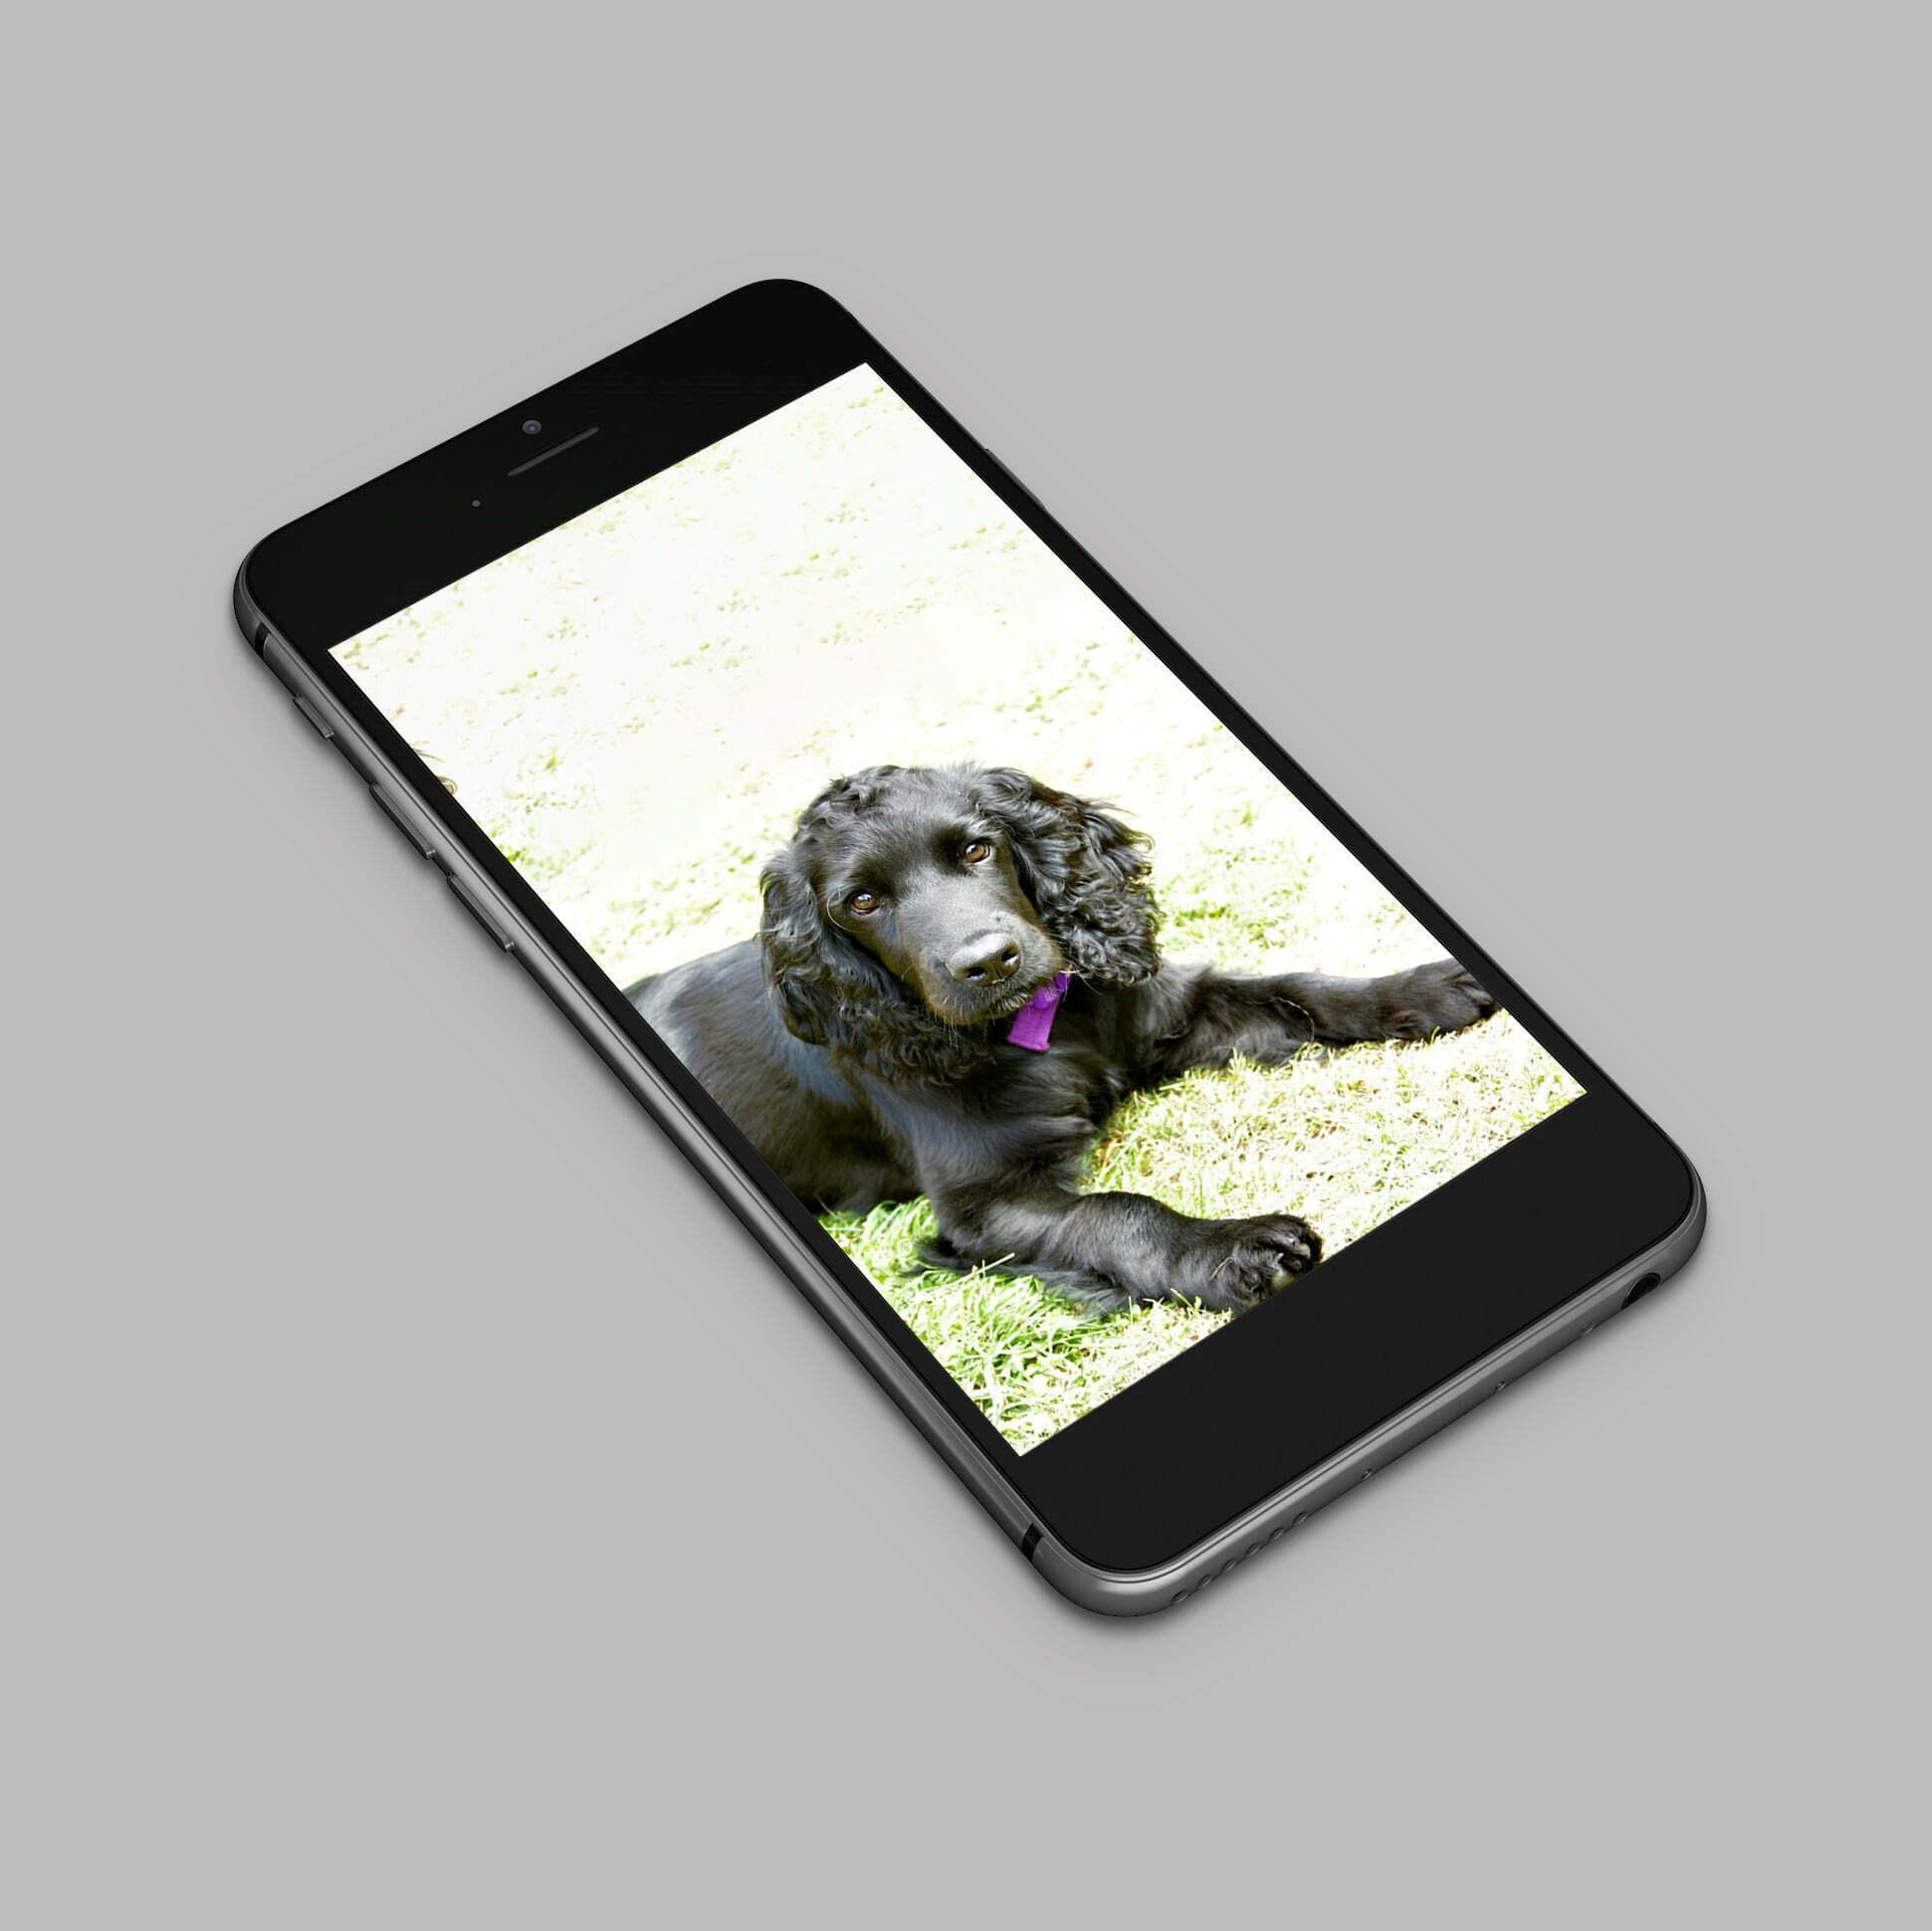 Cocker spaniel dog photo taken on mobile phone